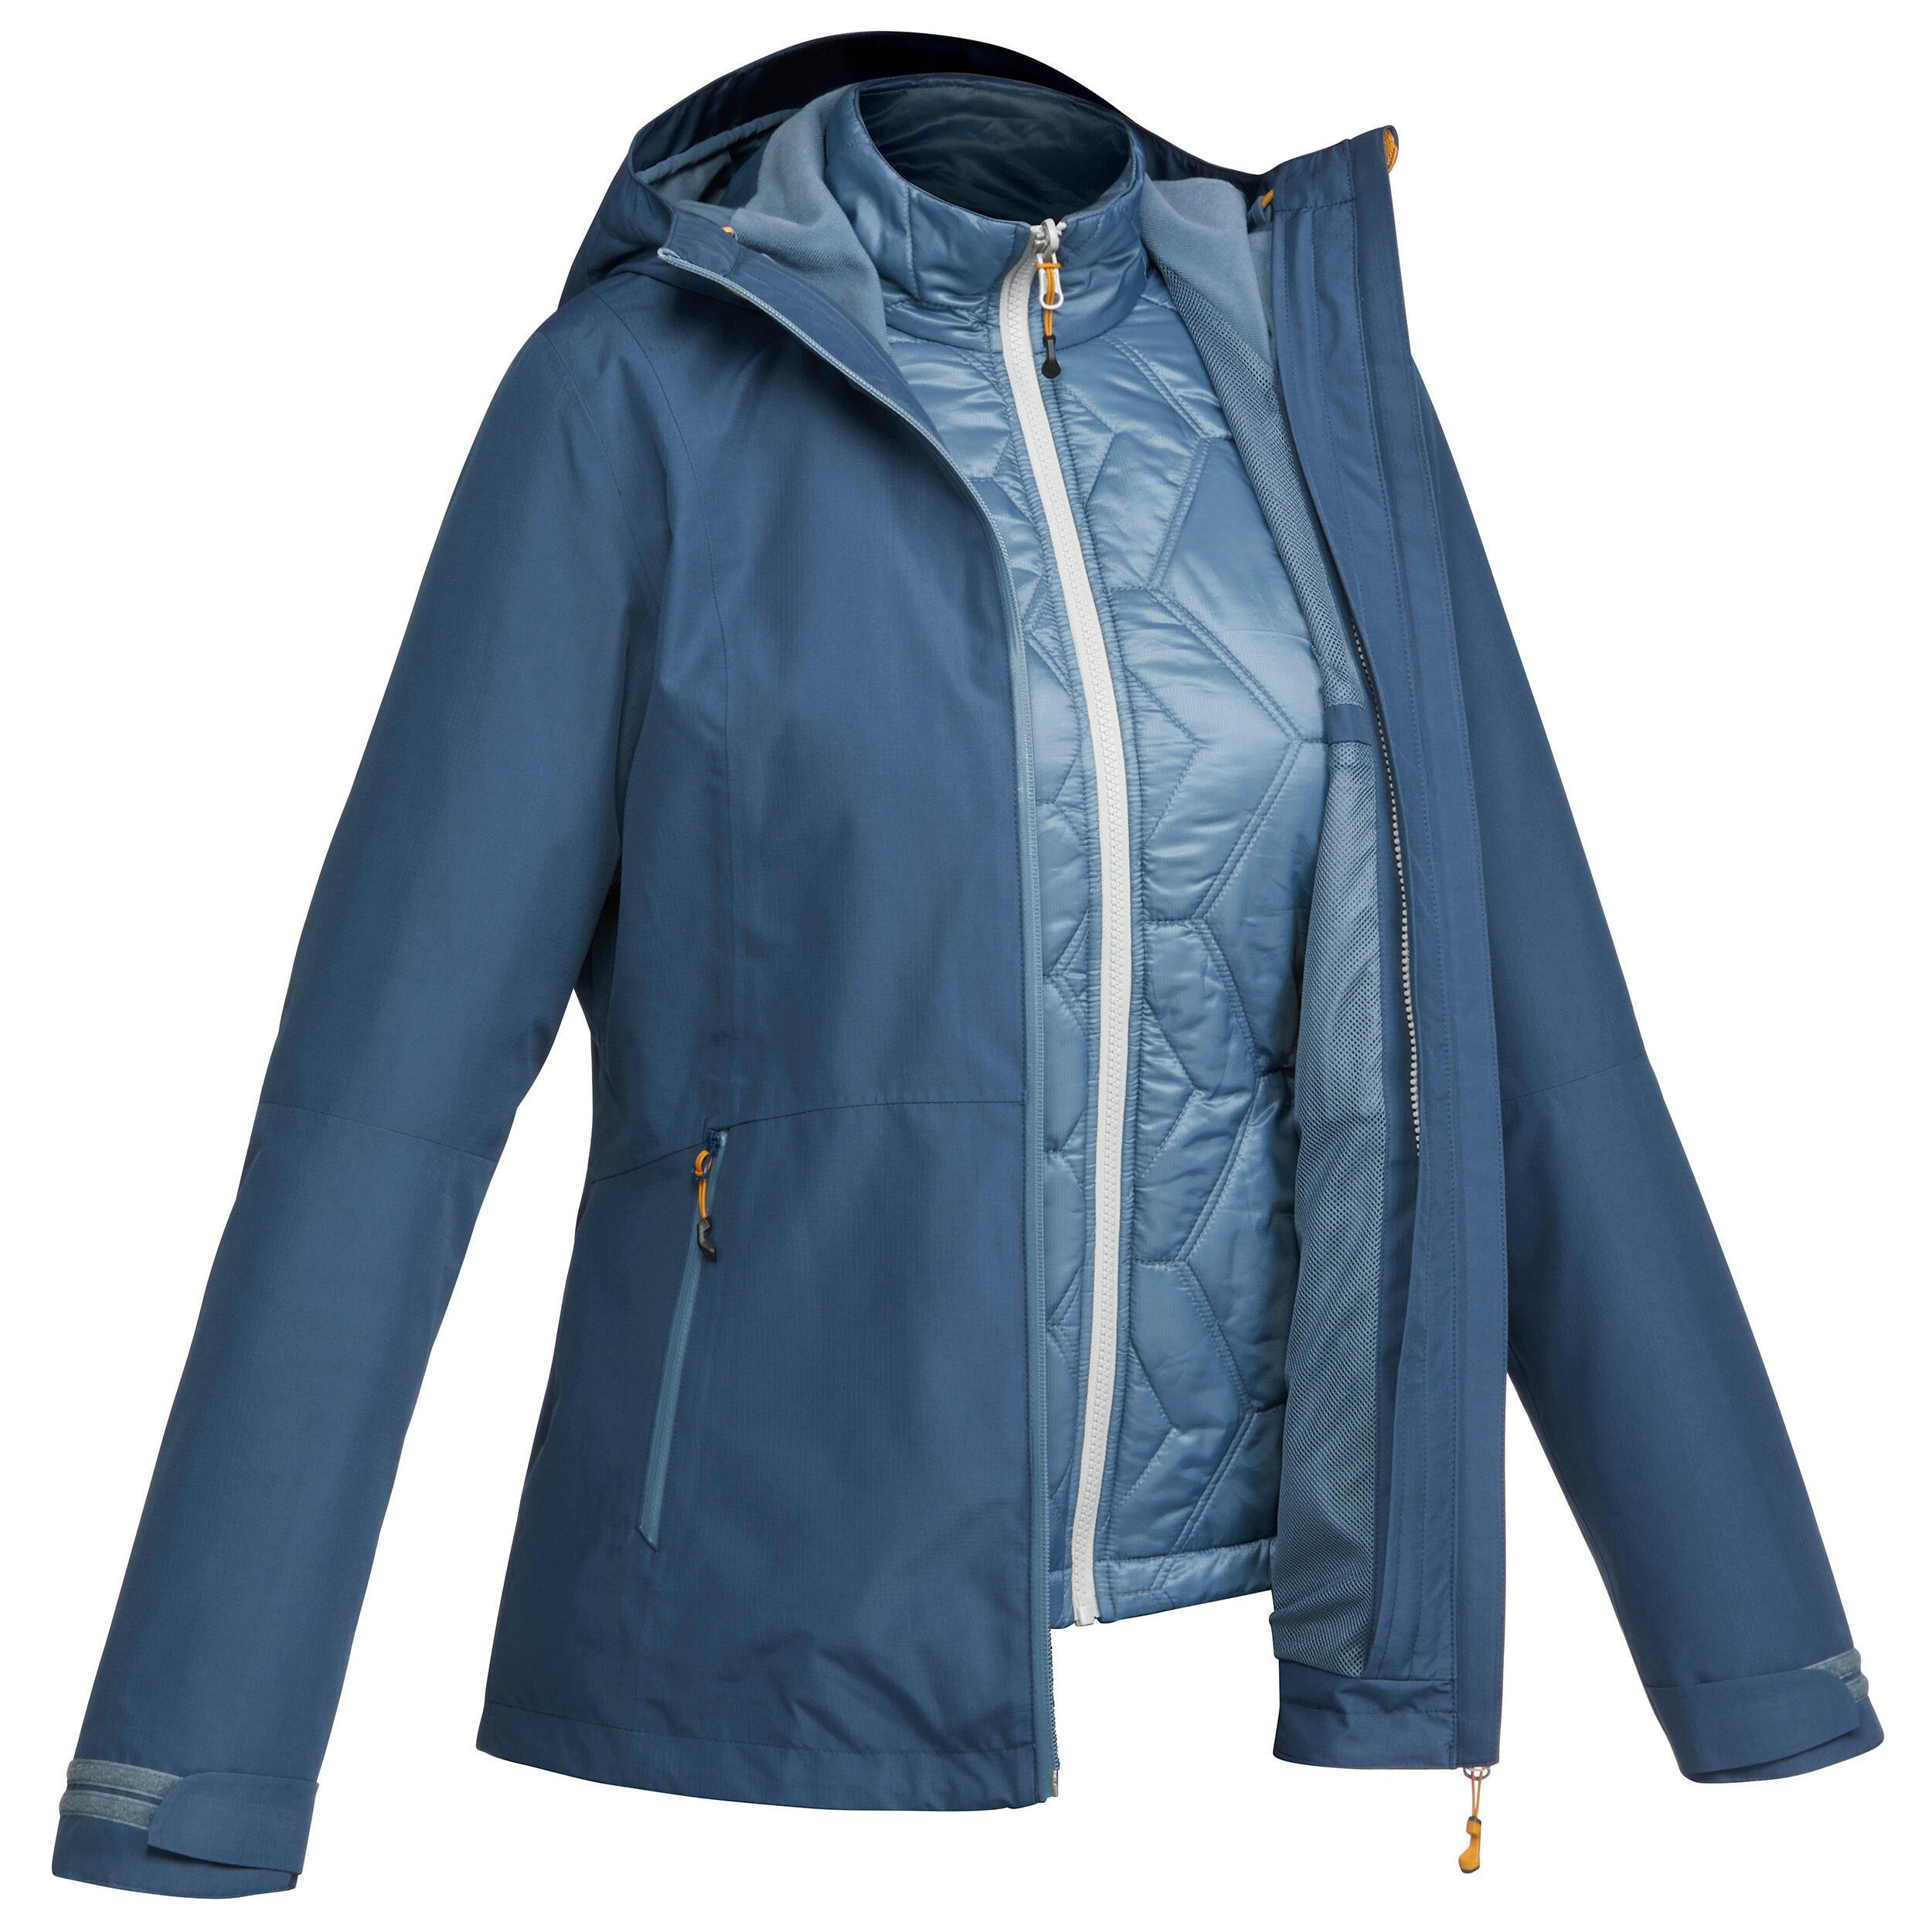 Veste trekking travel500 3en1 femme bleue quechua